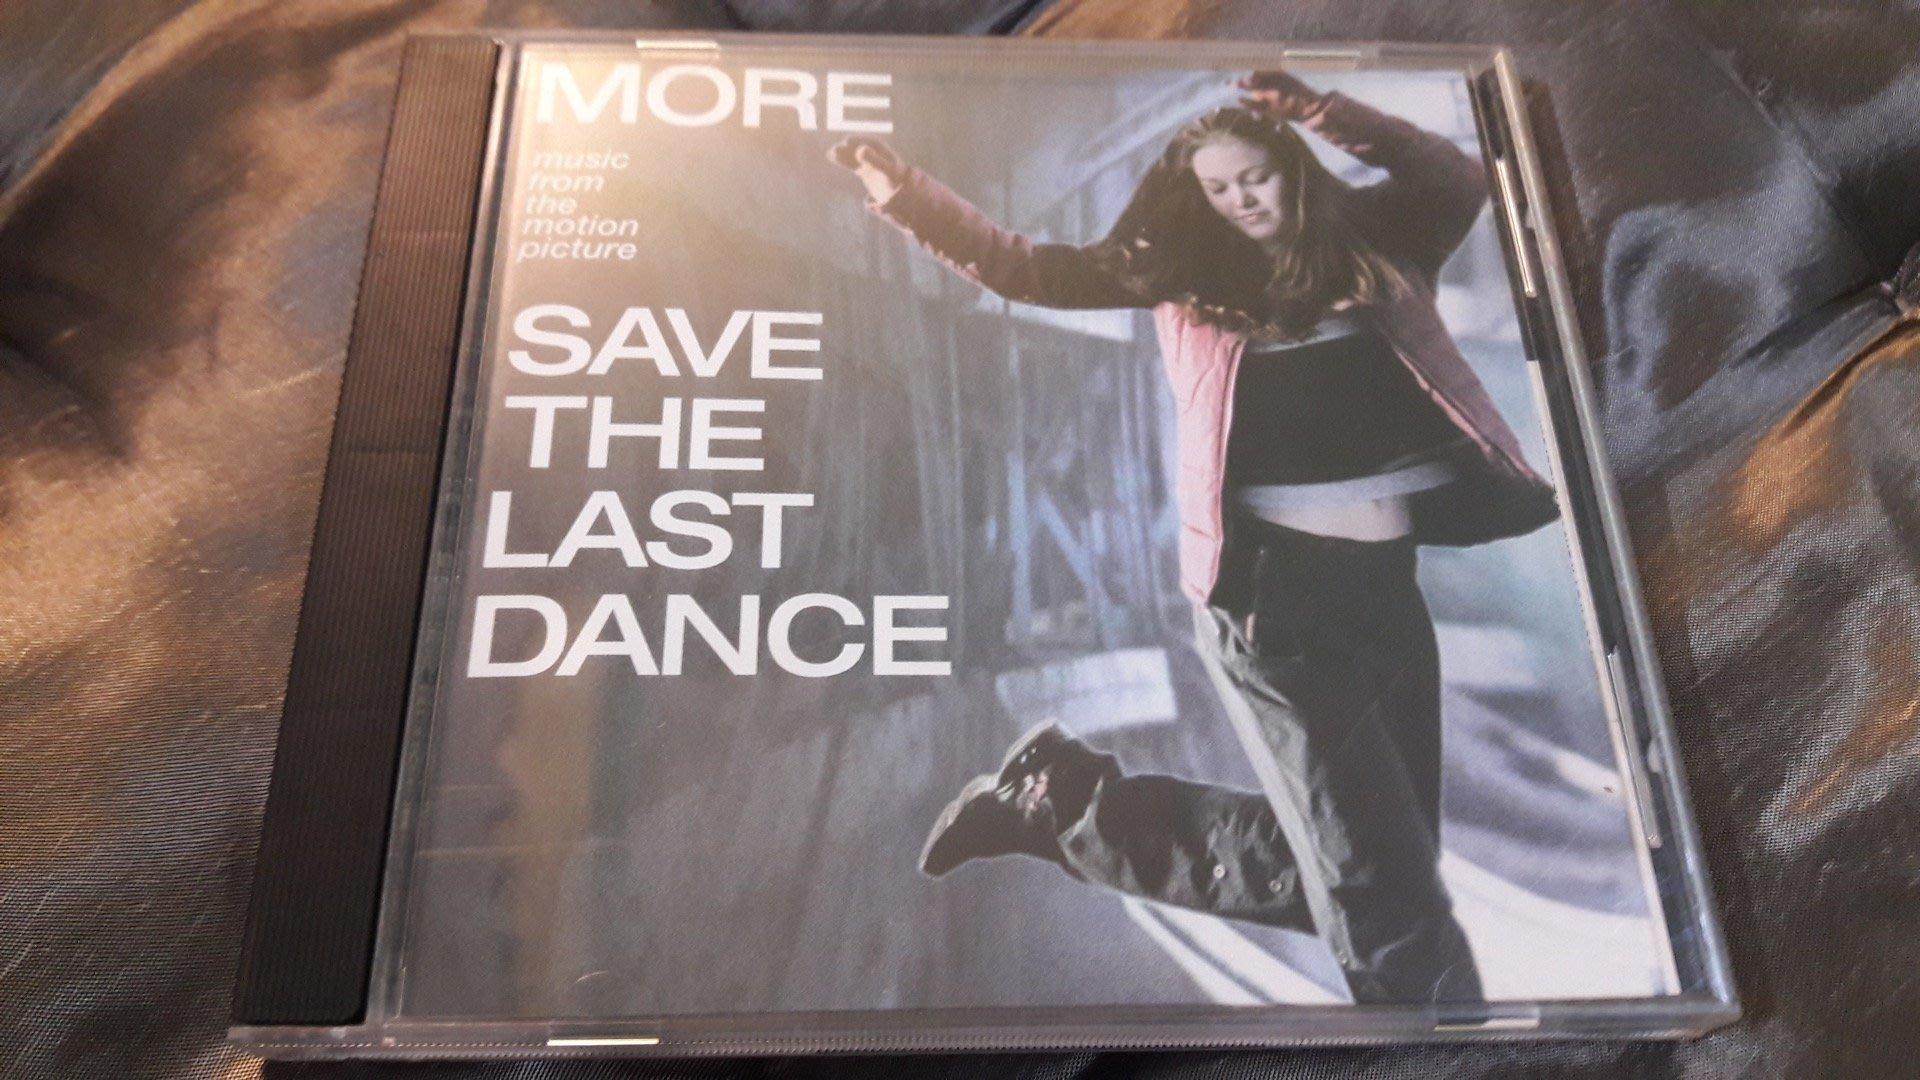 留住最後一支舞 電影原聲帶 續篇/ More music from Save The Last Dance-二手CD